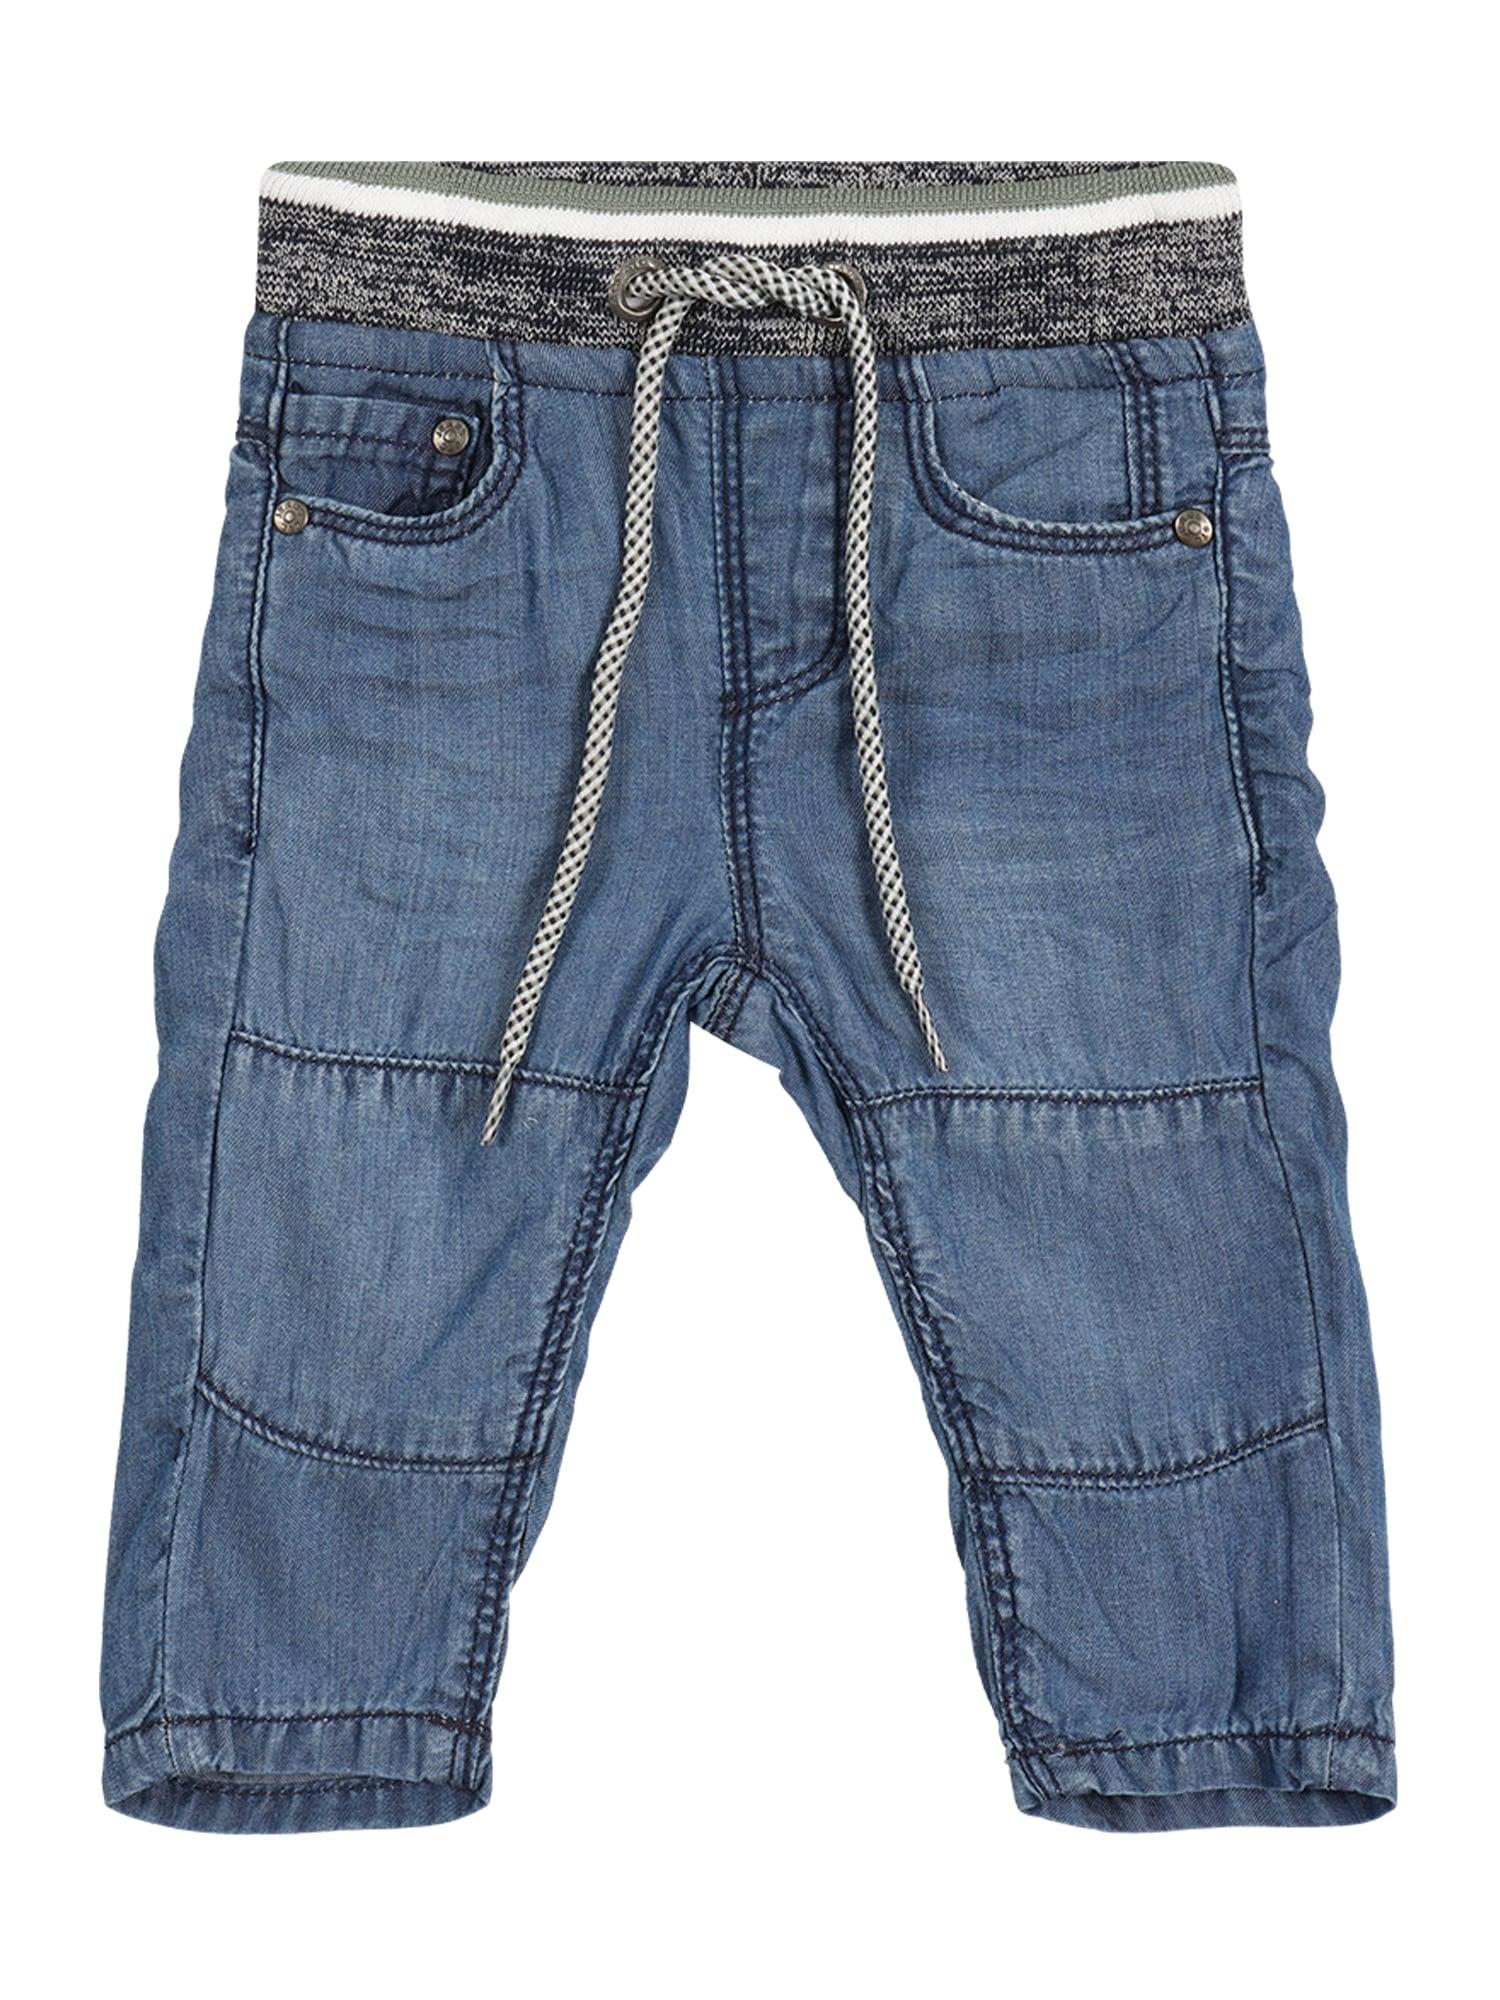 STACCATO Džinsai tamsiai (džinso) mėlyna / margai pilka / balta